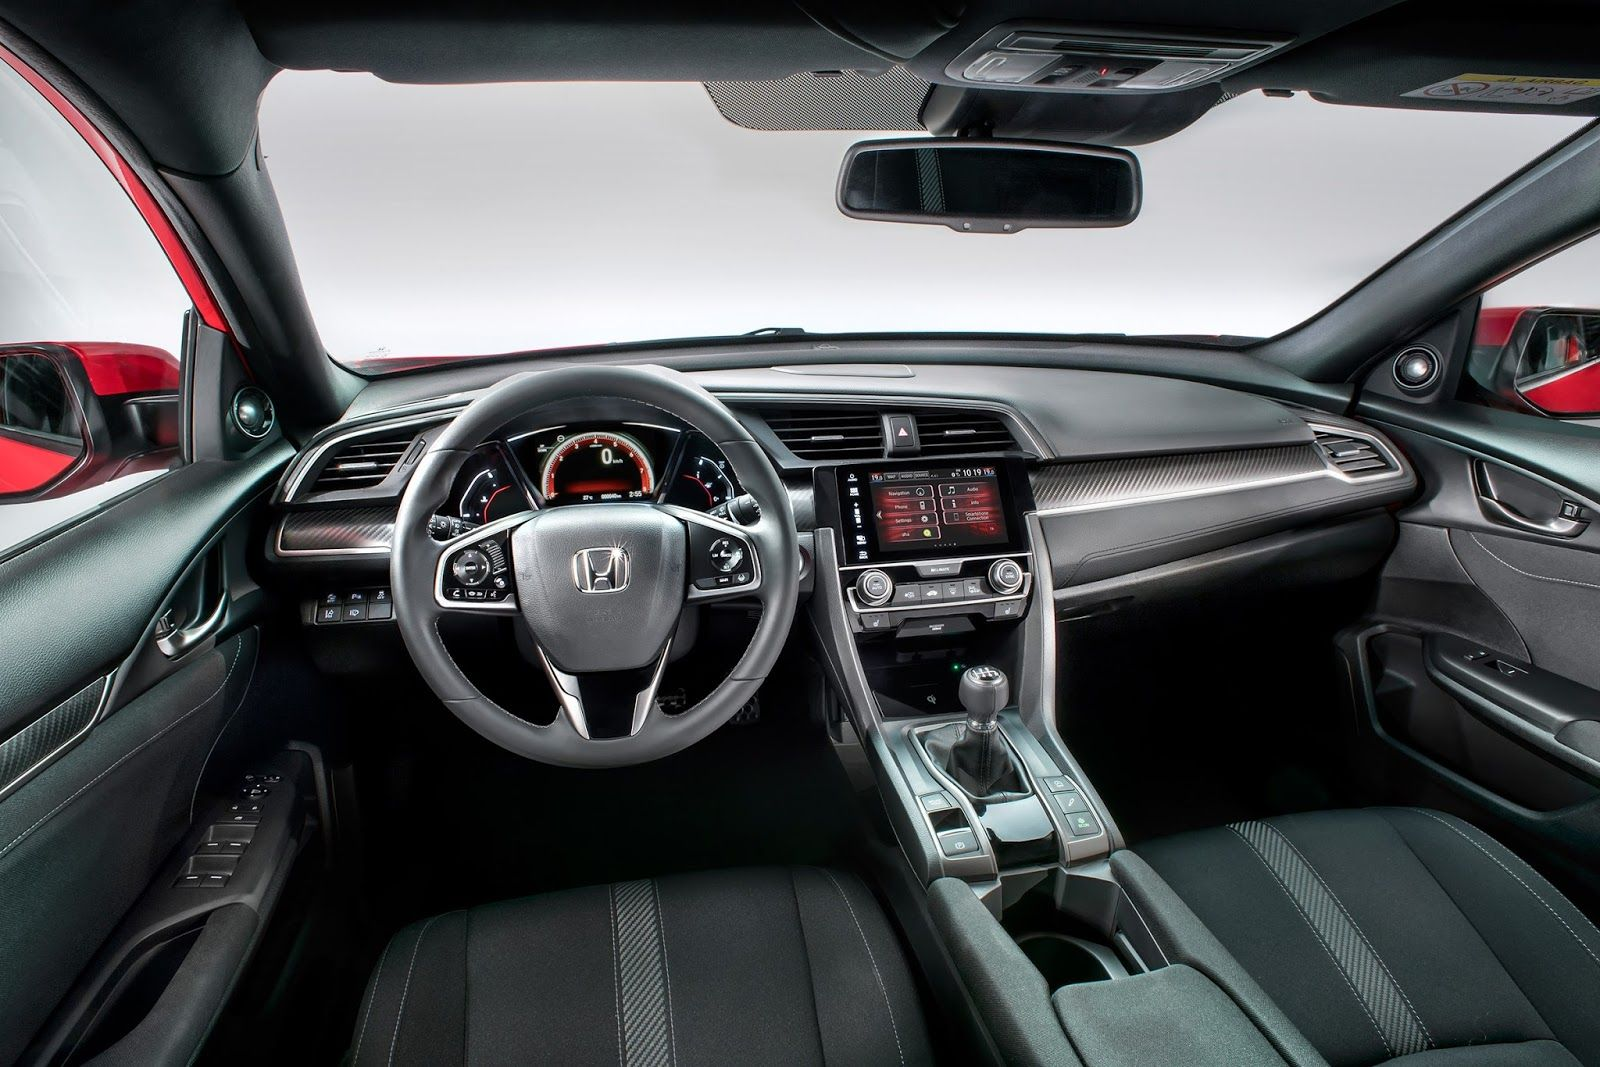 2017 Honda Civic Hatchback Interior Coupe